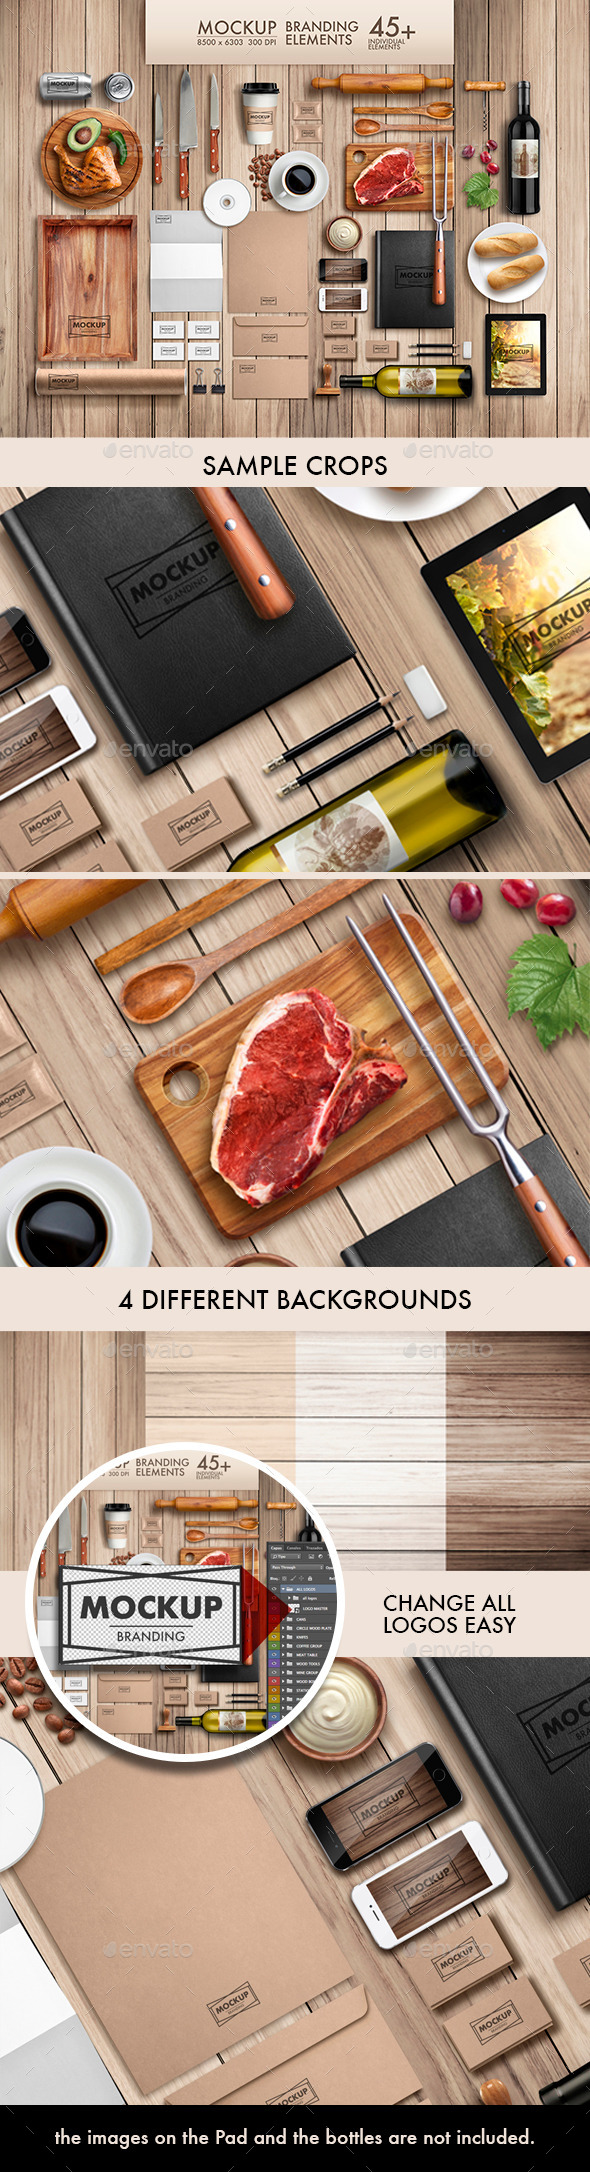 Branding Elements Mock-Up Vol 01 - Product Mock-Ups Graphics